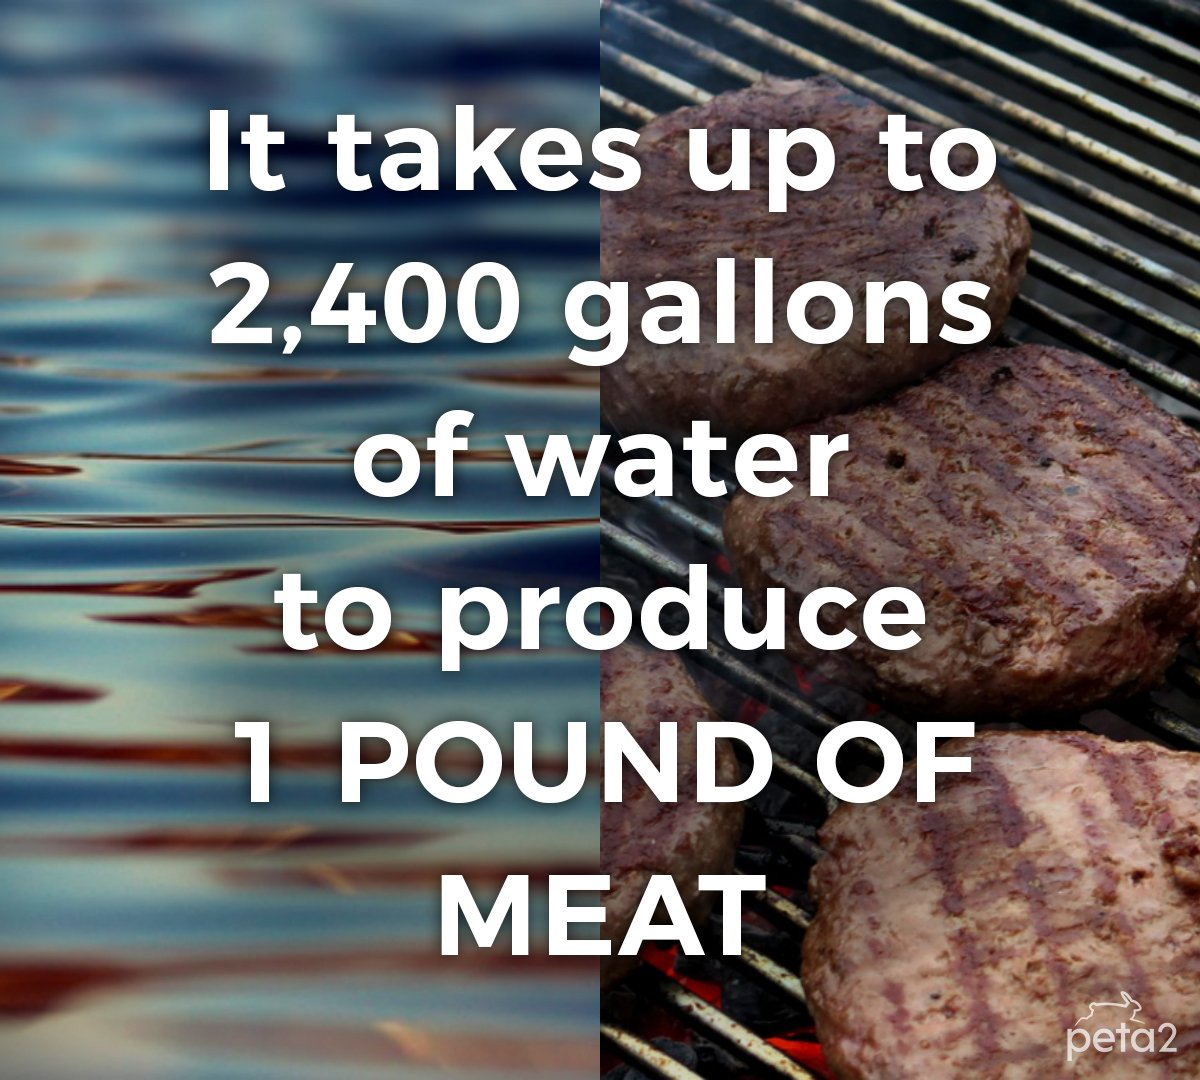 Save water 💦 Go vegan 🌿 #WorldWaterDay 🌍 https://t.co/jvGJDvcN27